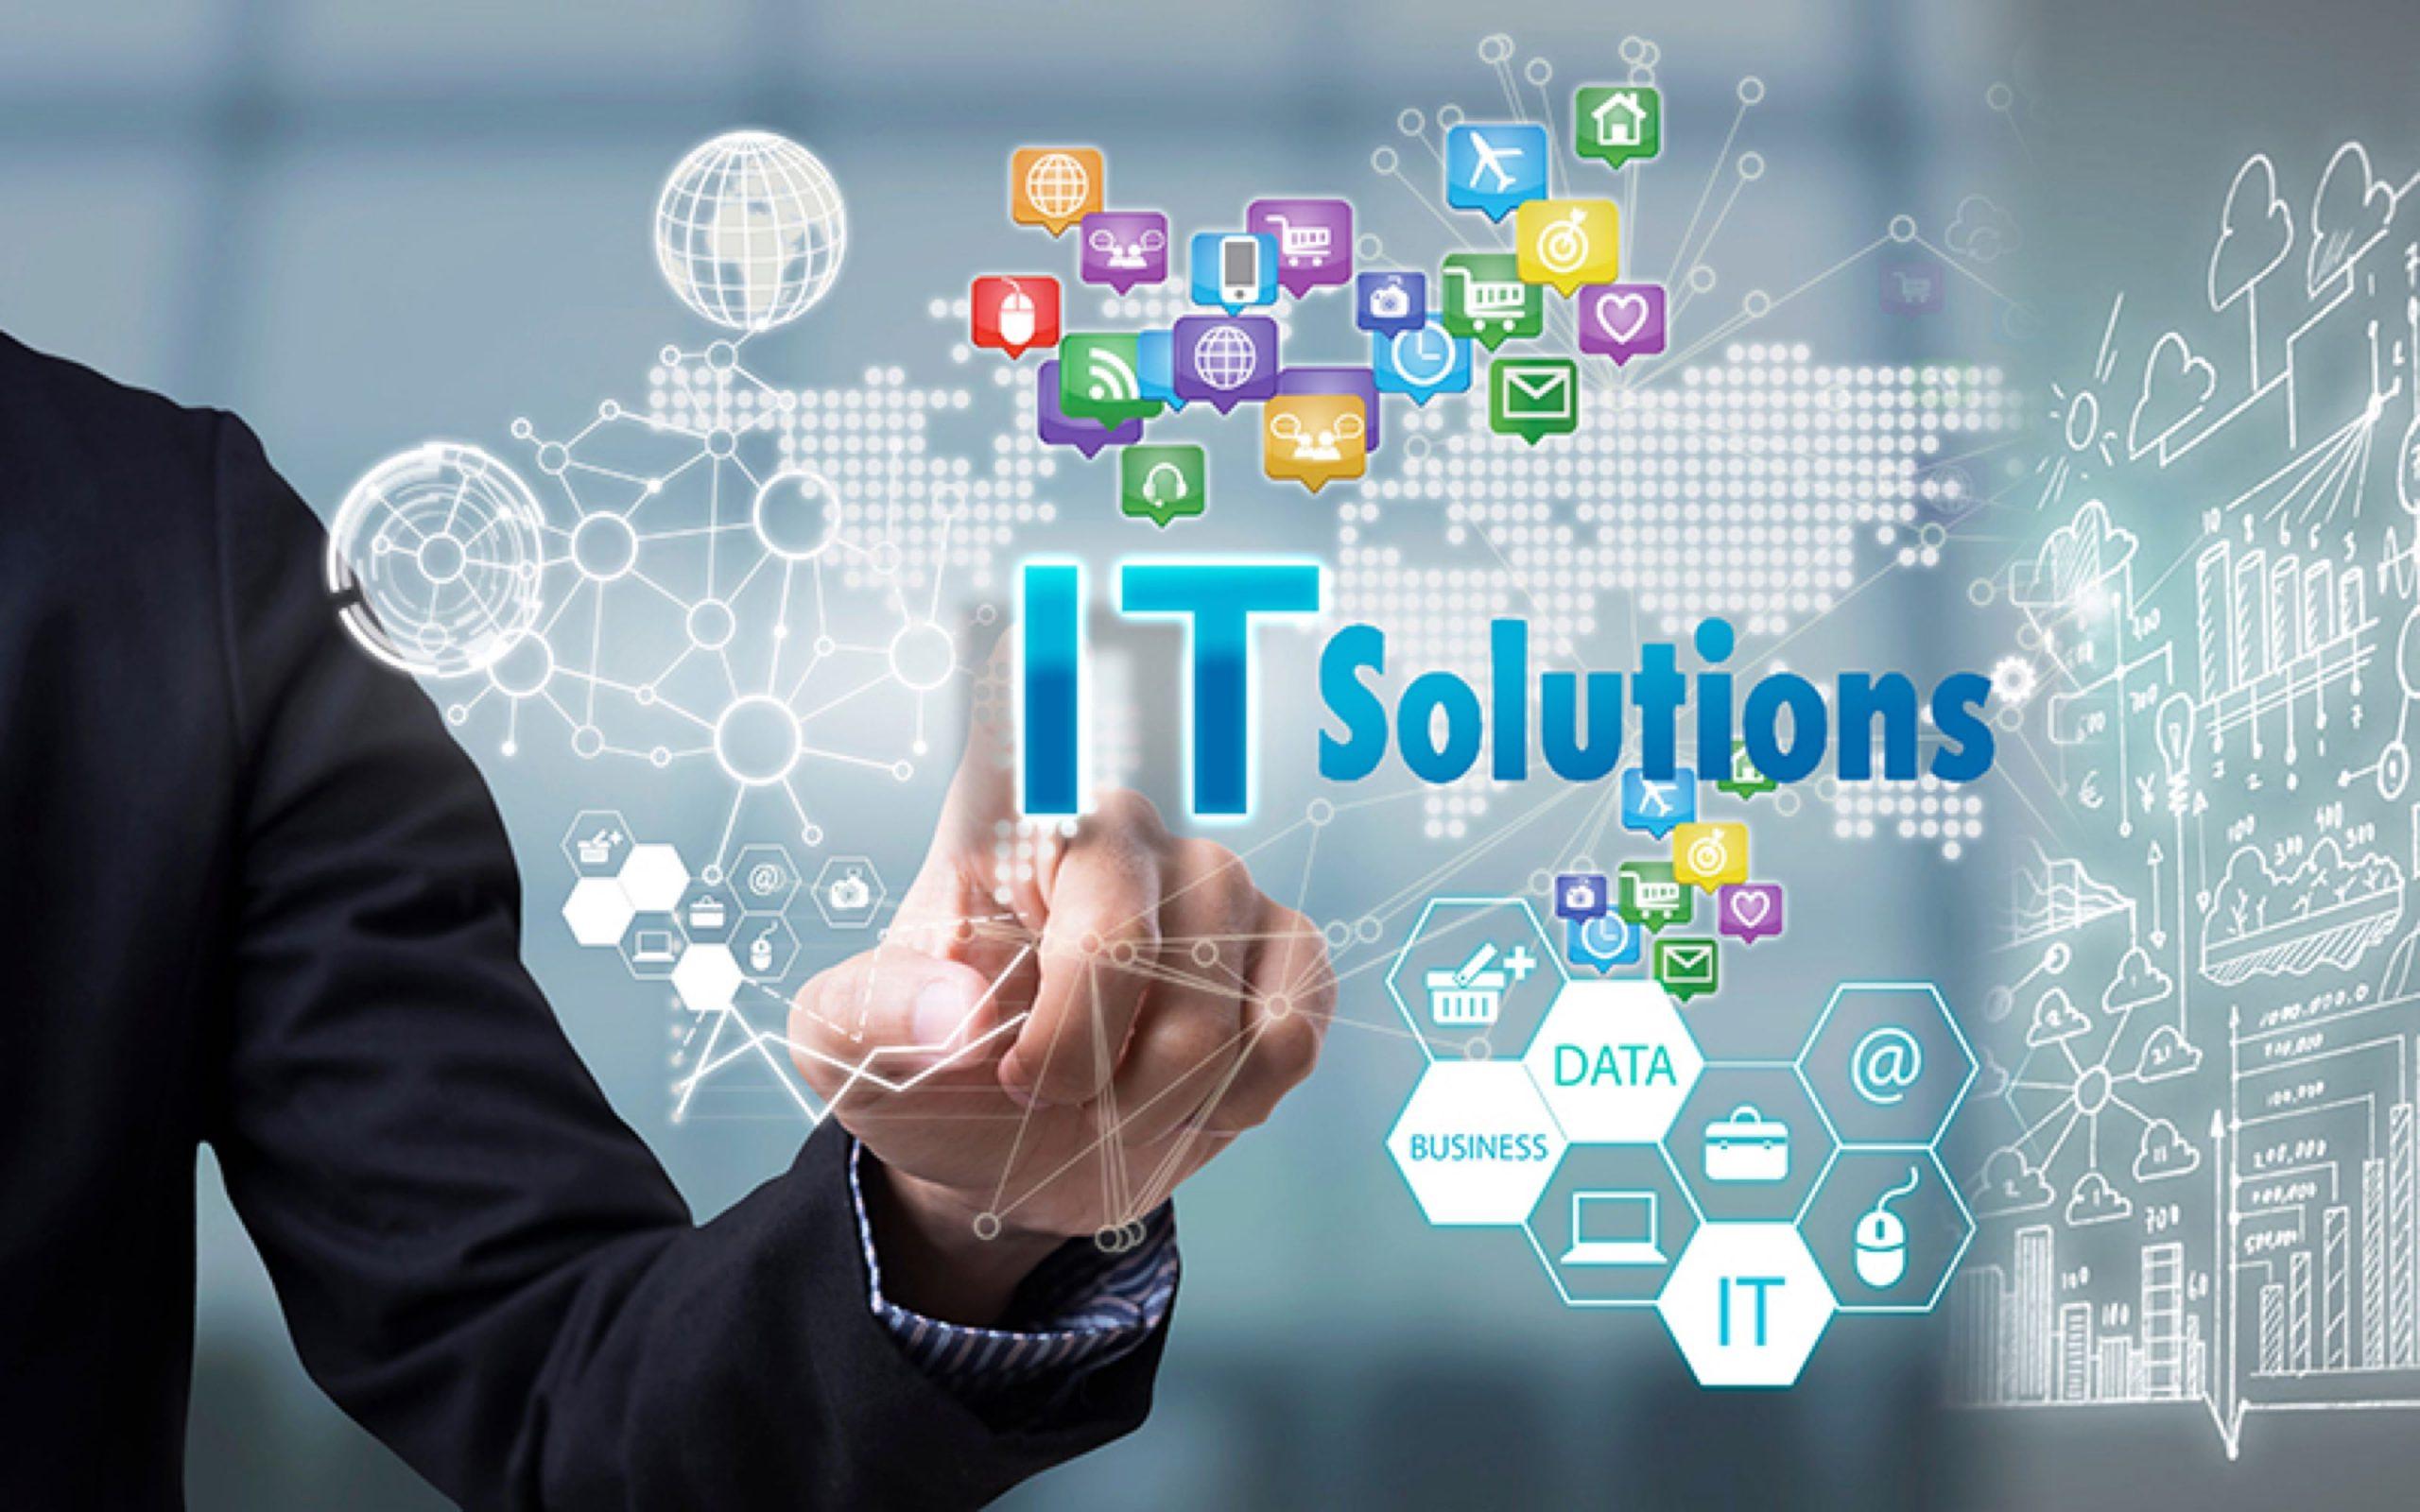 Liberty International IT Solutions